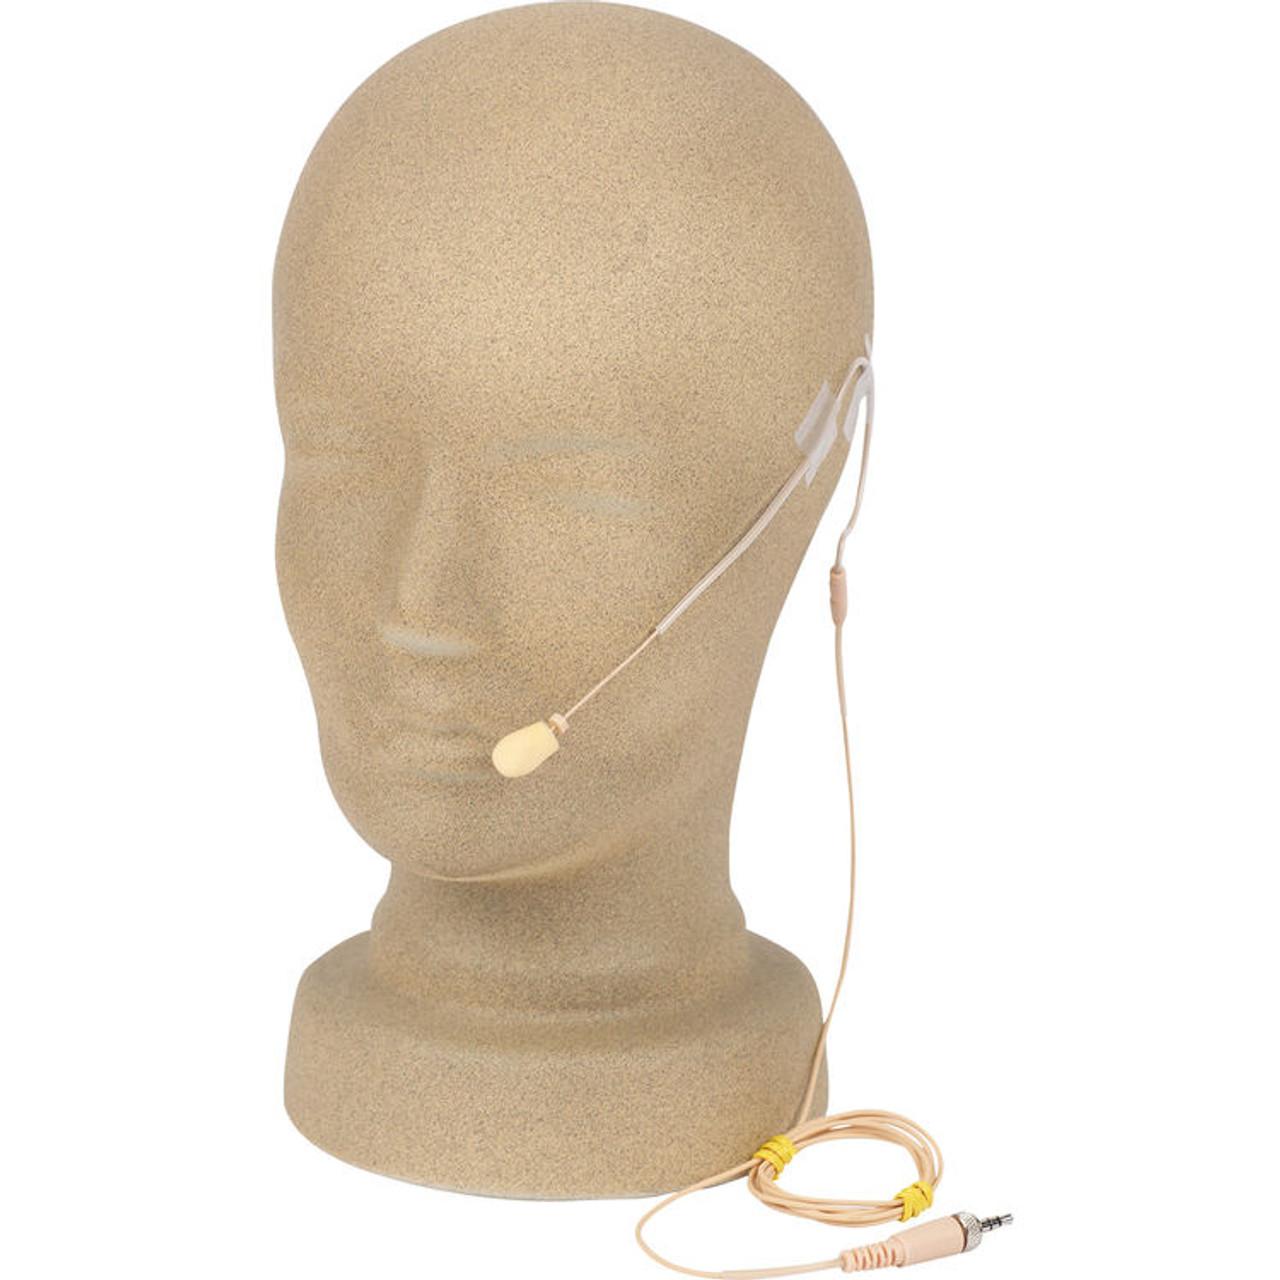 Anchor Audio EM-LINK UltraLite Mic